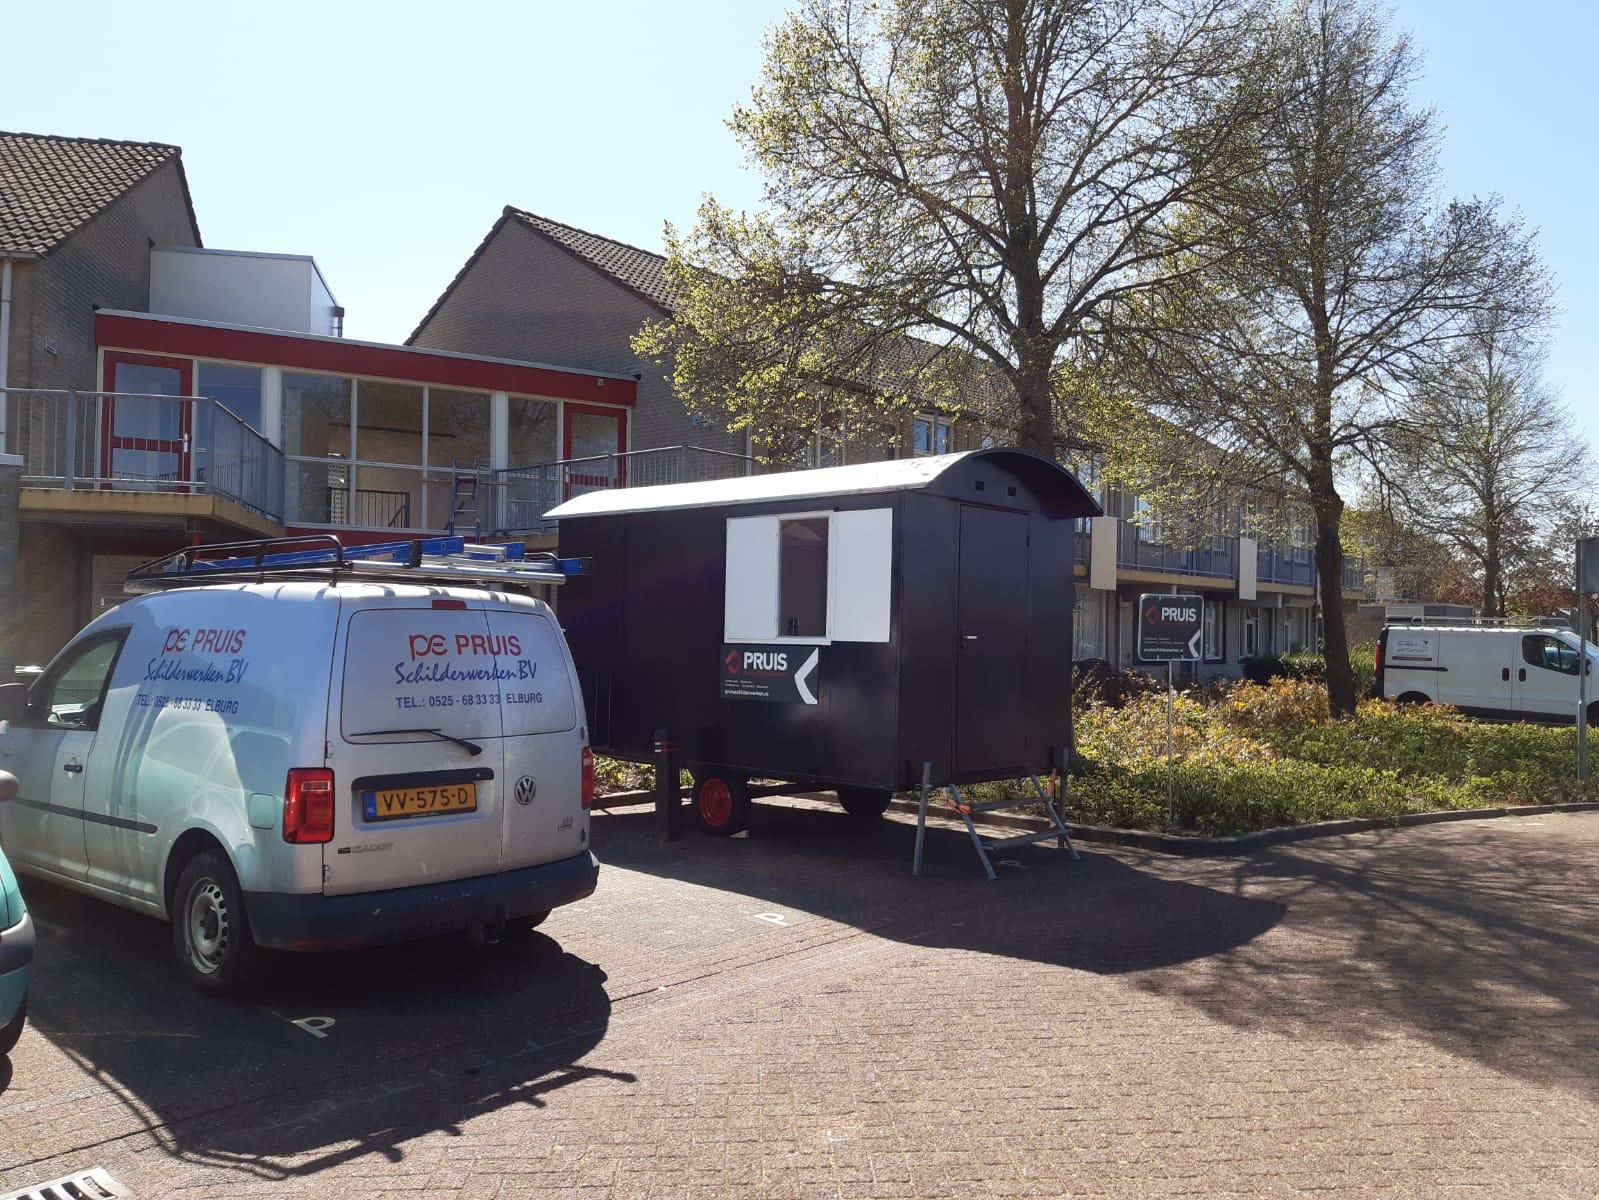 Pruis Schilderwerken Onderhoud Elburg 2020